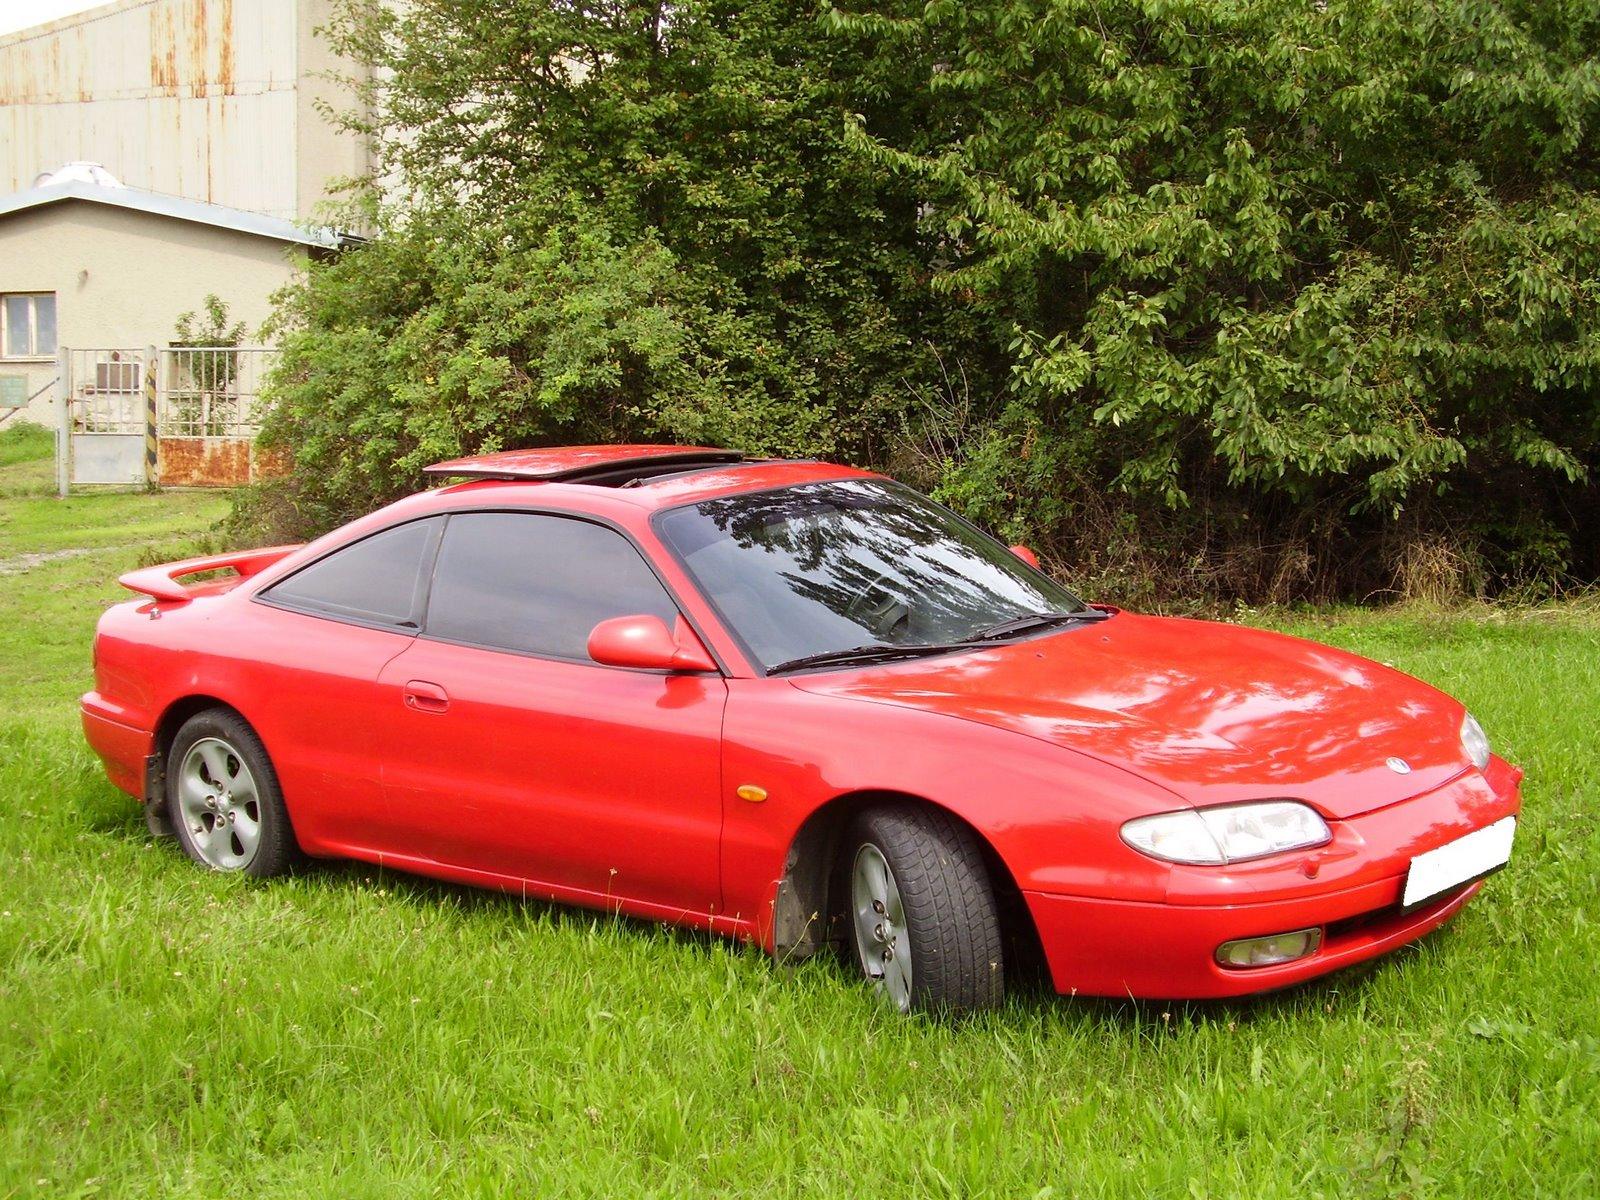 Mazda B2000 B2600 Wiring Diagram Legend 1991 Mazda B2000 B2600 Wiring